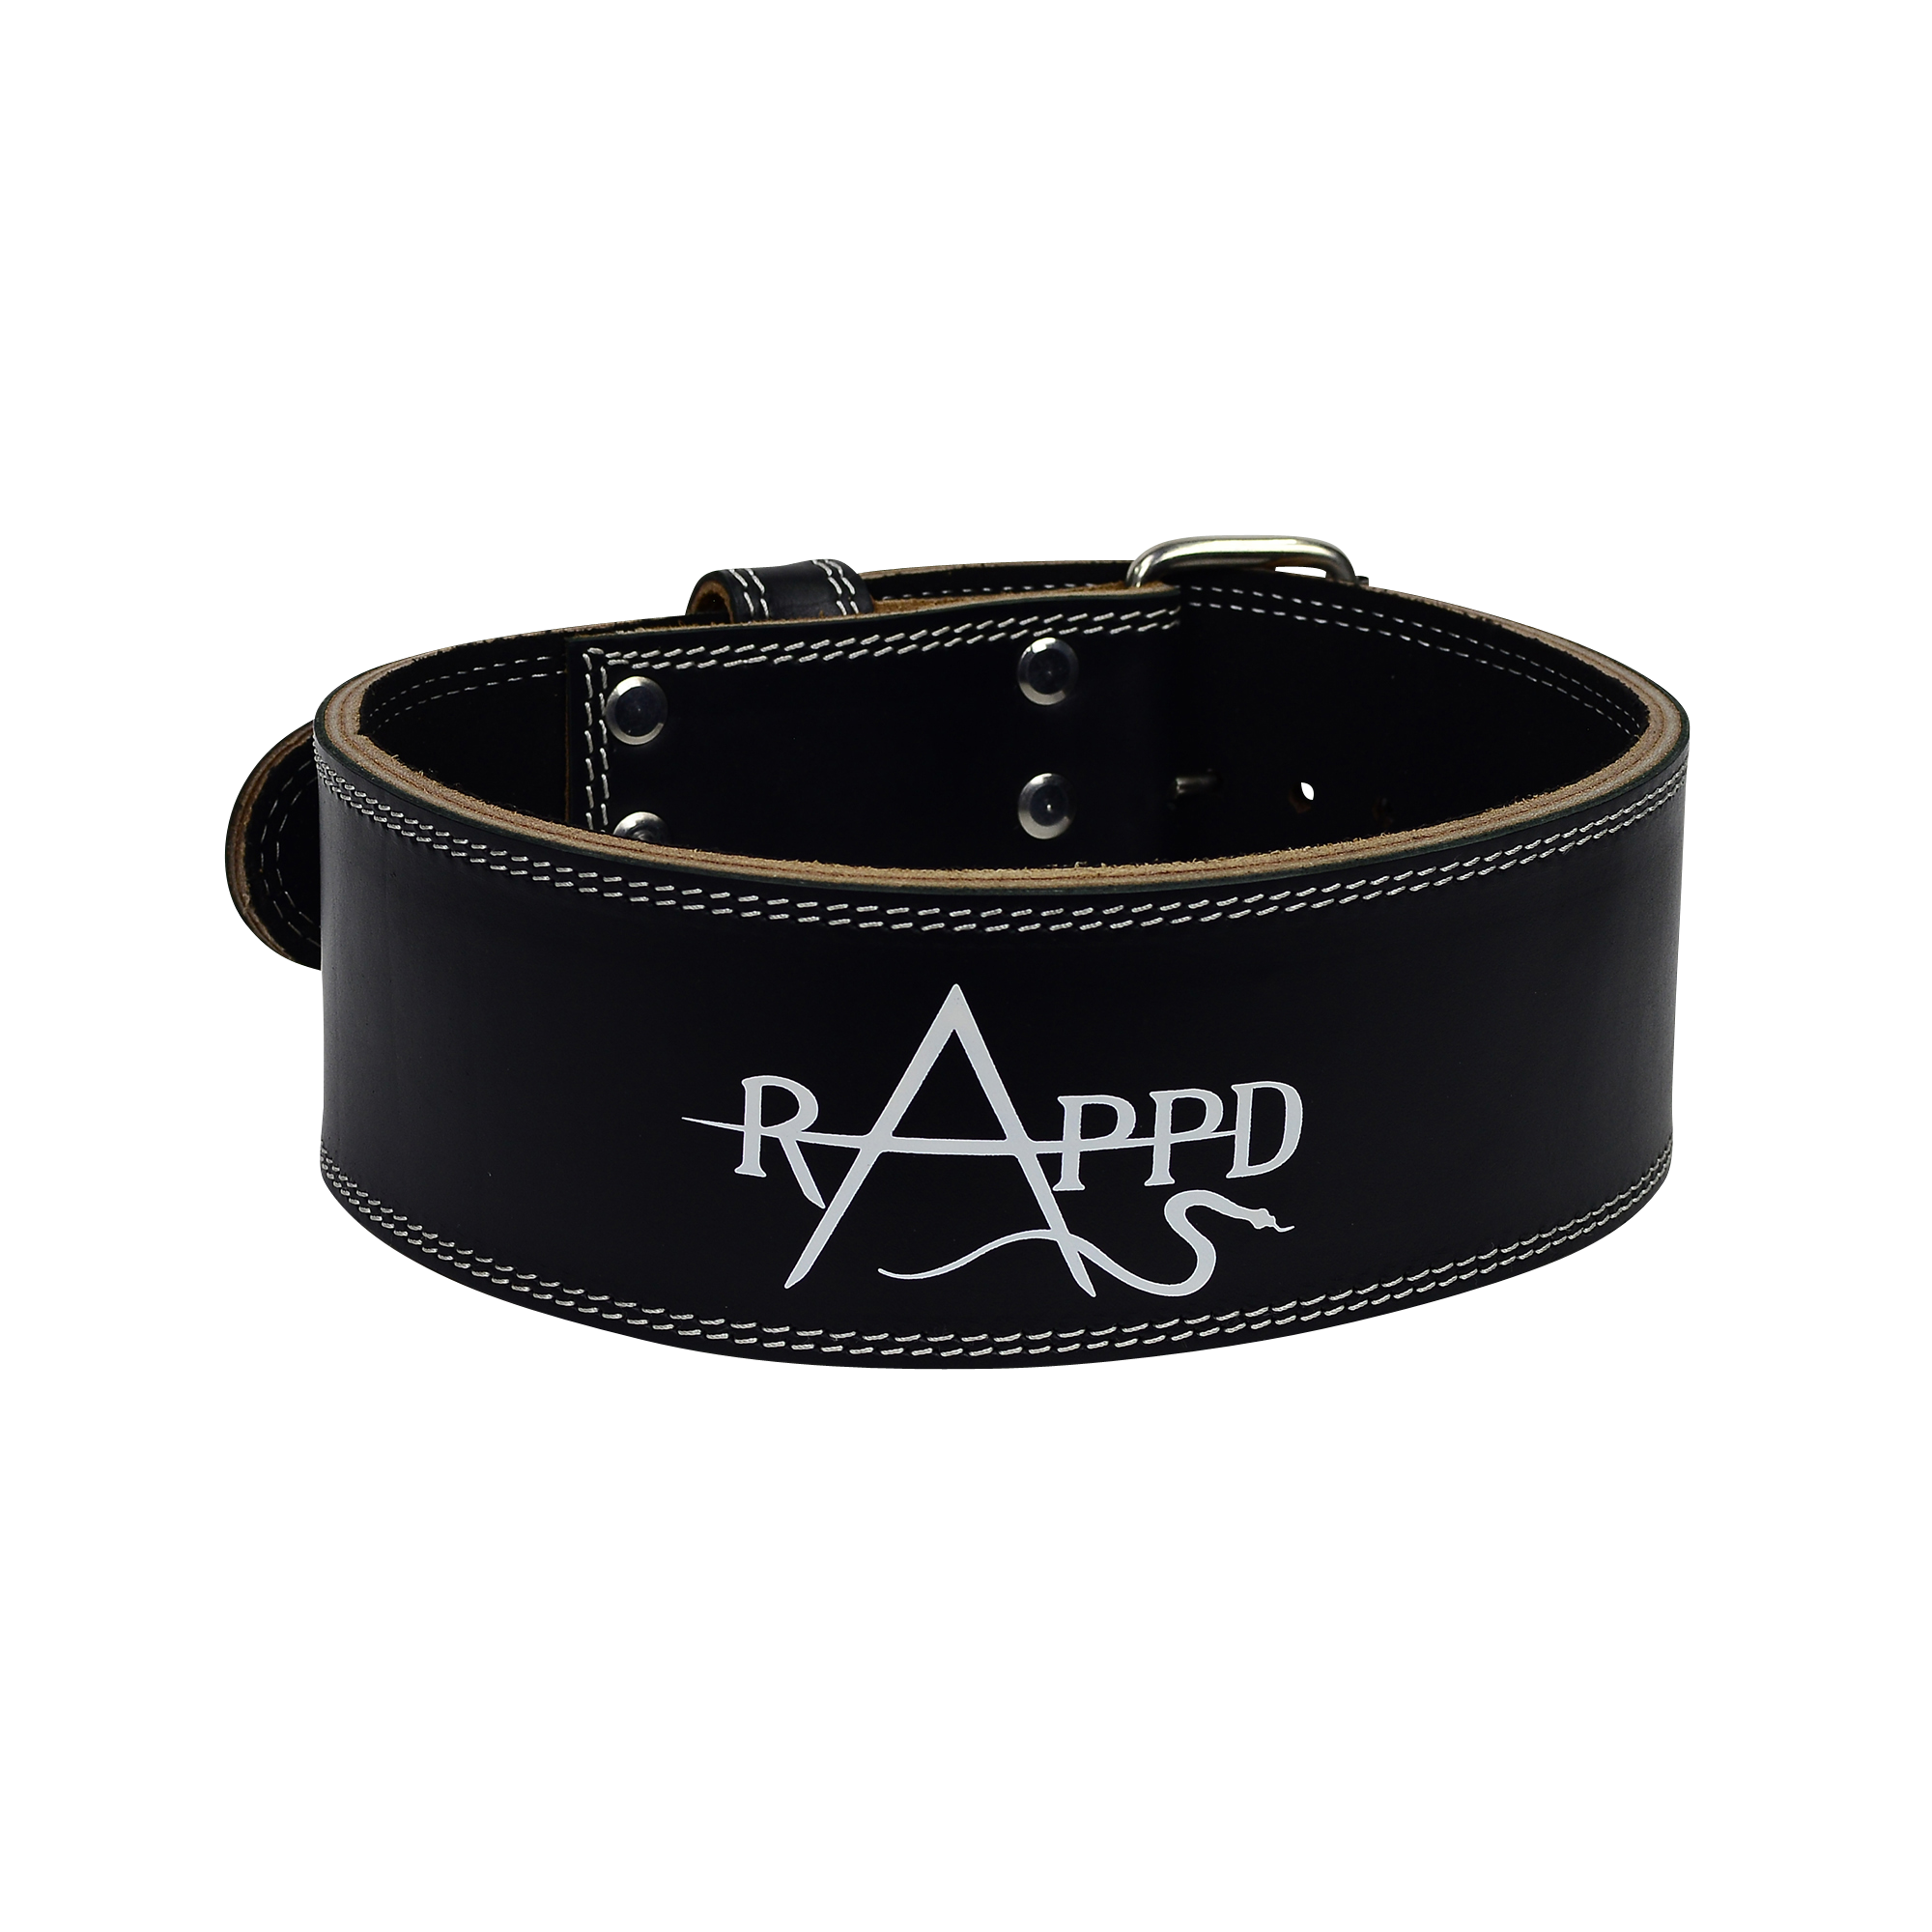 RAPPD Classic Powerlifting Belt